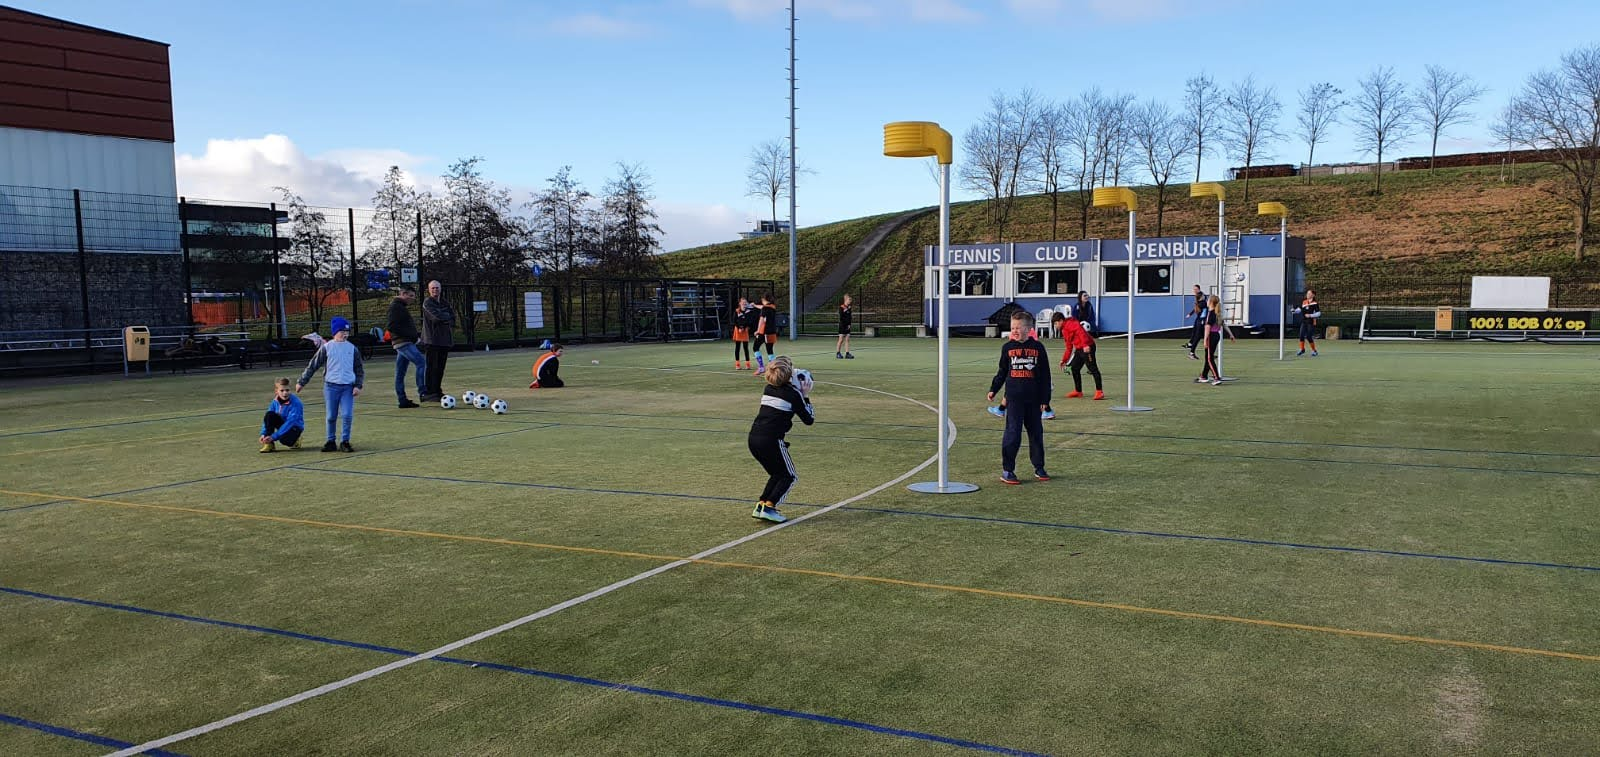 Sportpark Boswijk